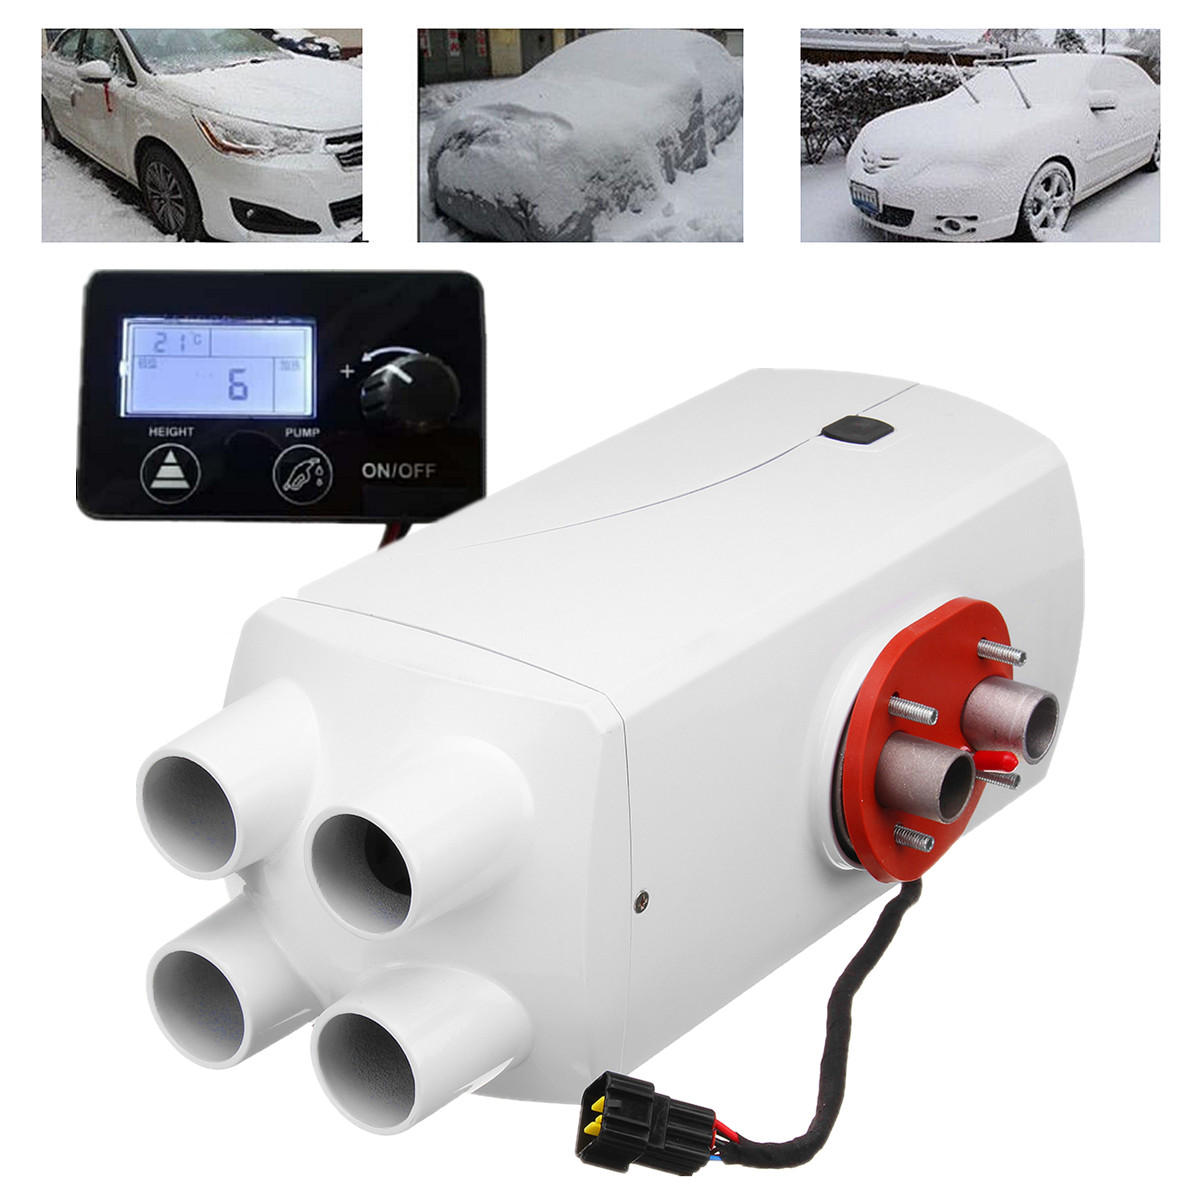 5000W/8000W Diesel Air Parking Heater 4 Holes Aluminum Alloy Diesel Heating Parking Air Heater5000W/8000W Diesel Air Parking Heater 4 Holes Aluminum Alloy Diesel Heating Parking Air Heater